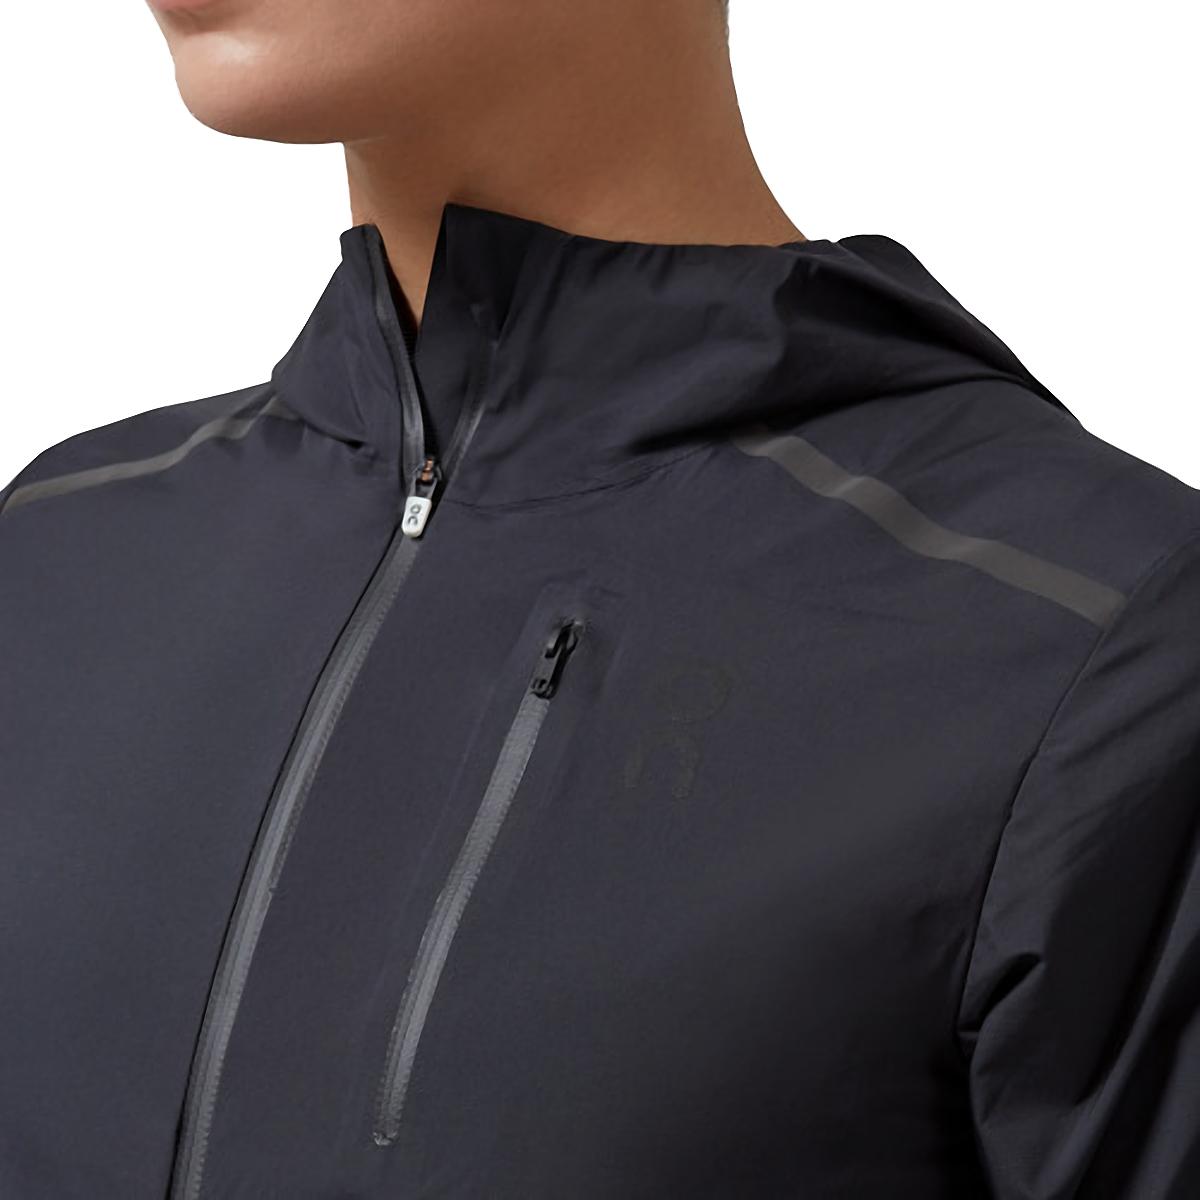 Men's New Balance Boroughs 2020 Short Sleeve Shirt - Color: Navy - Size: M, Navy, large, image 4